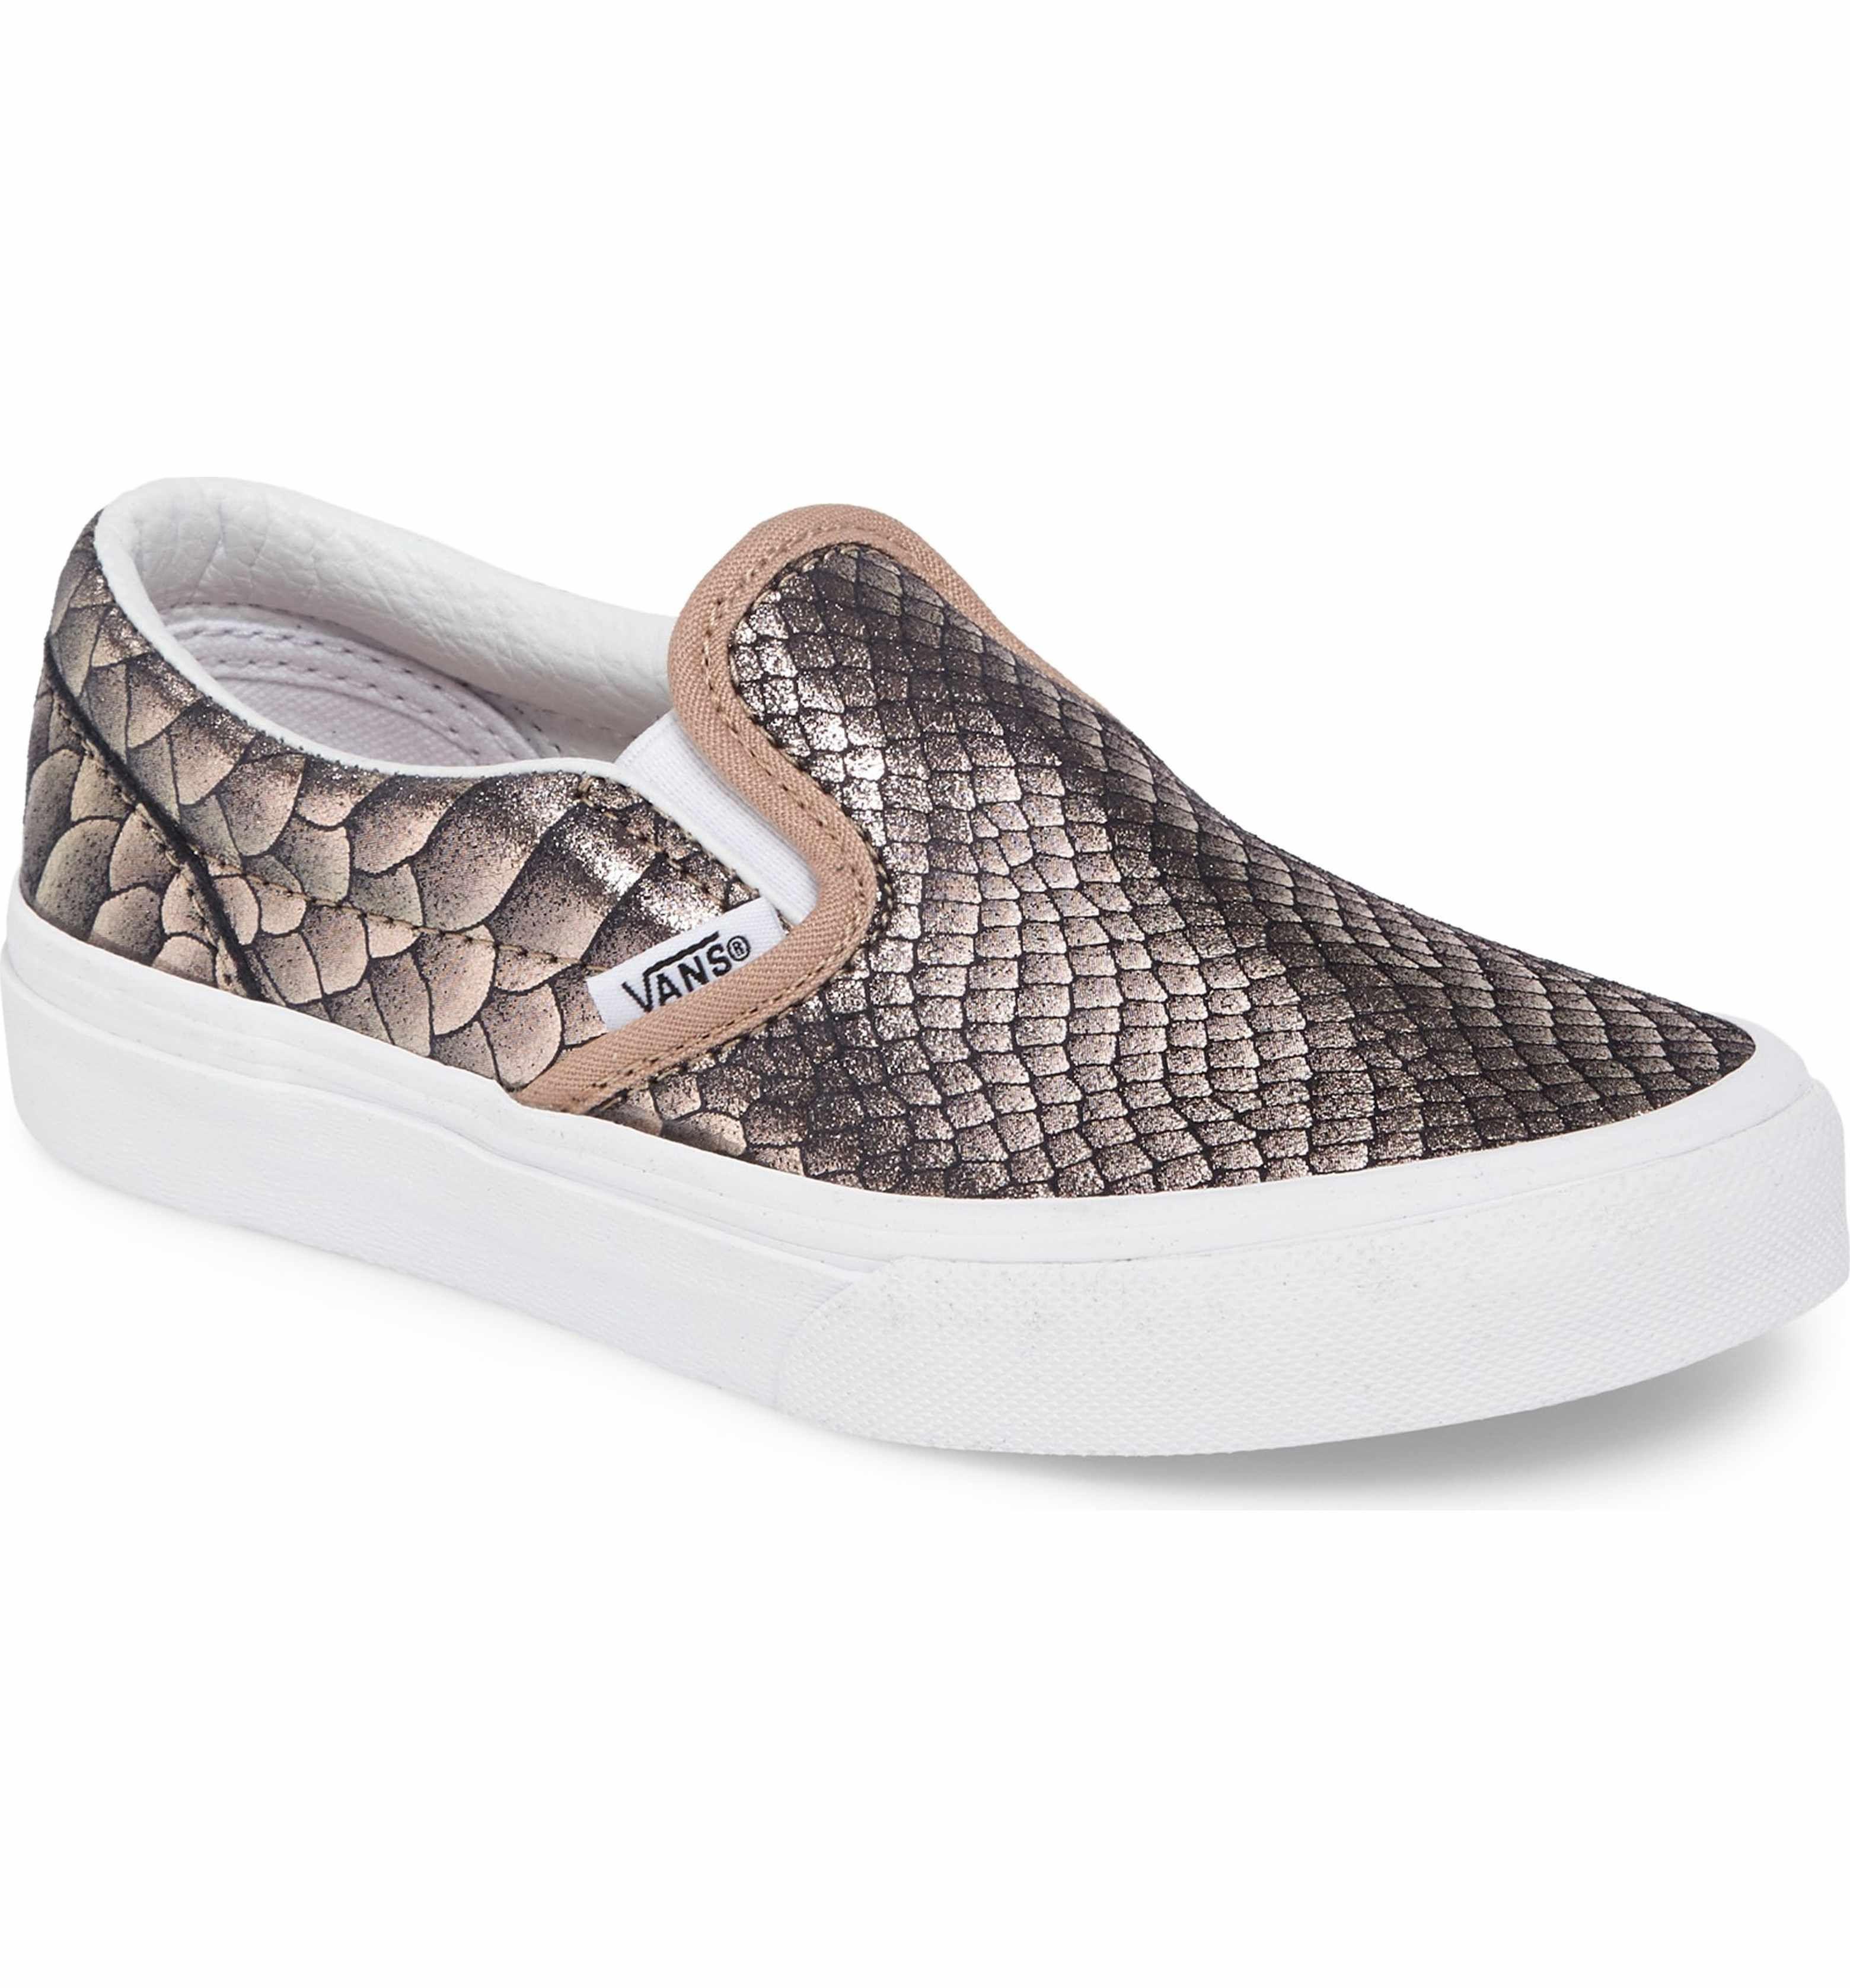 57886a92b403af Main Image - Vans Classic Slip-On Sneaker (Baby